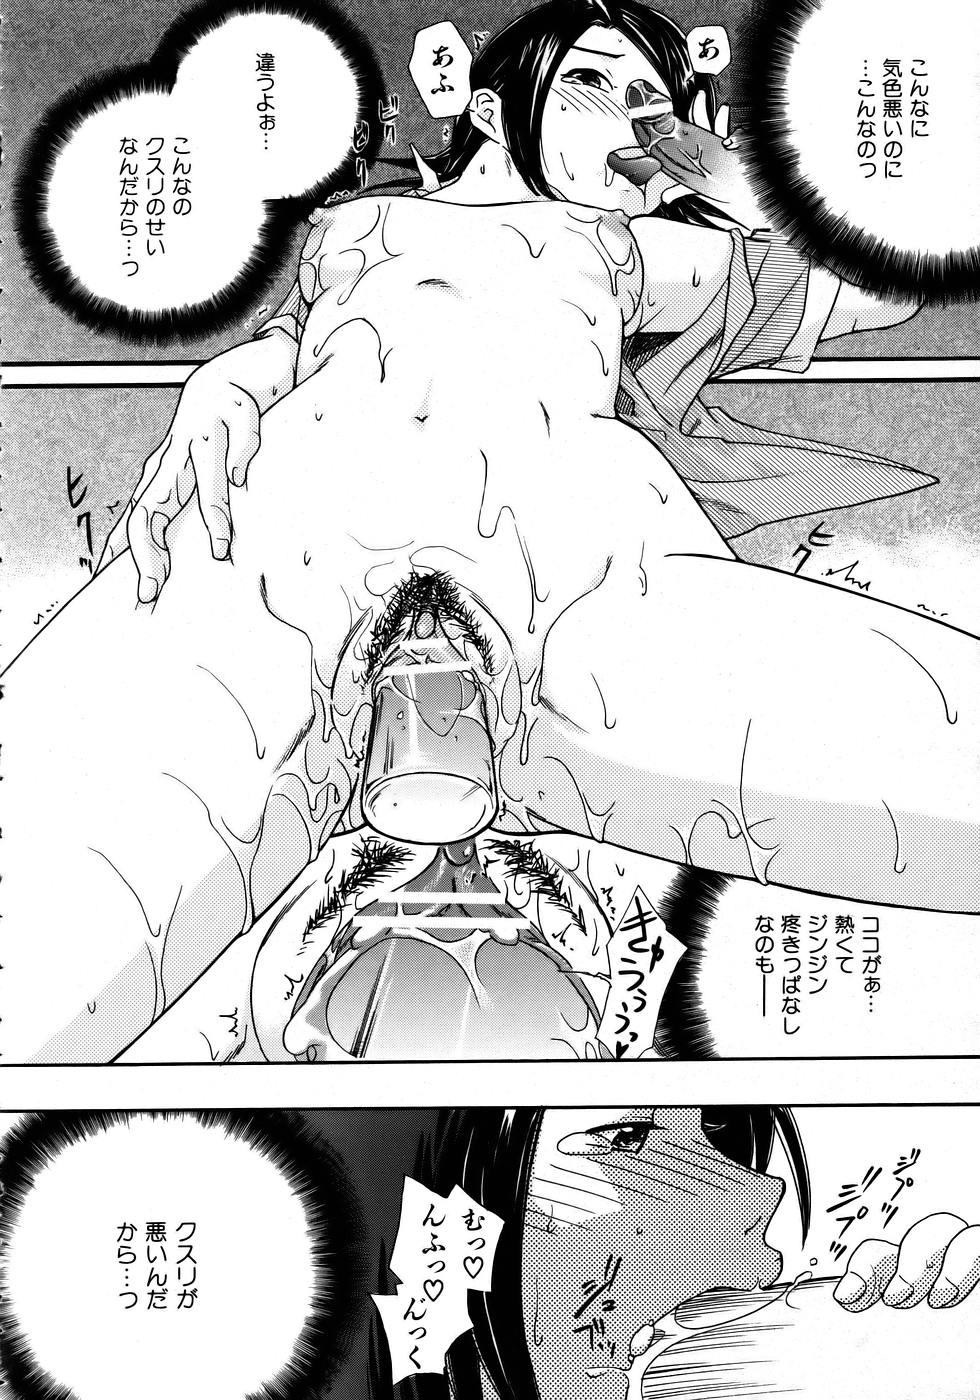 COMIC AUN 2005-12 Vol. 115 253